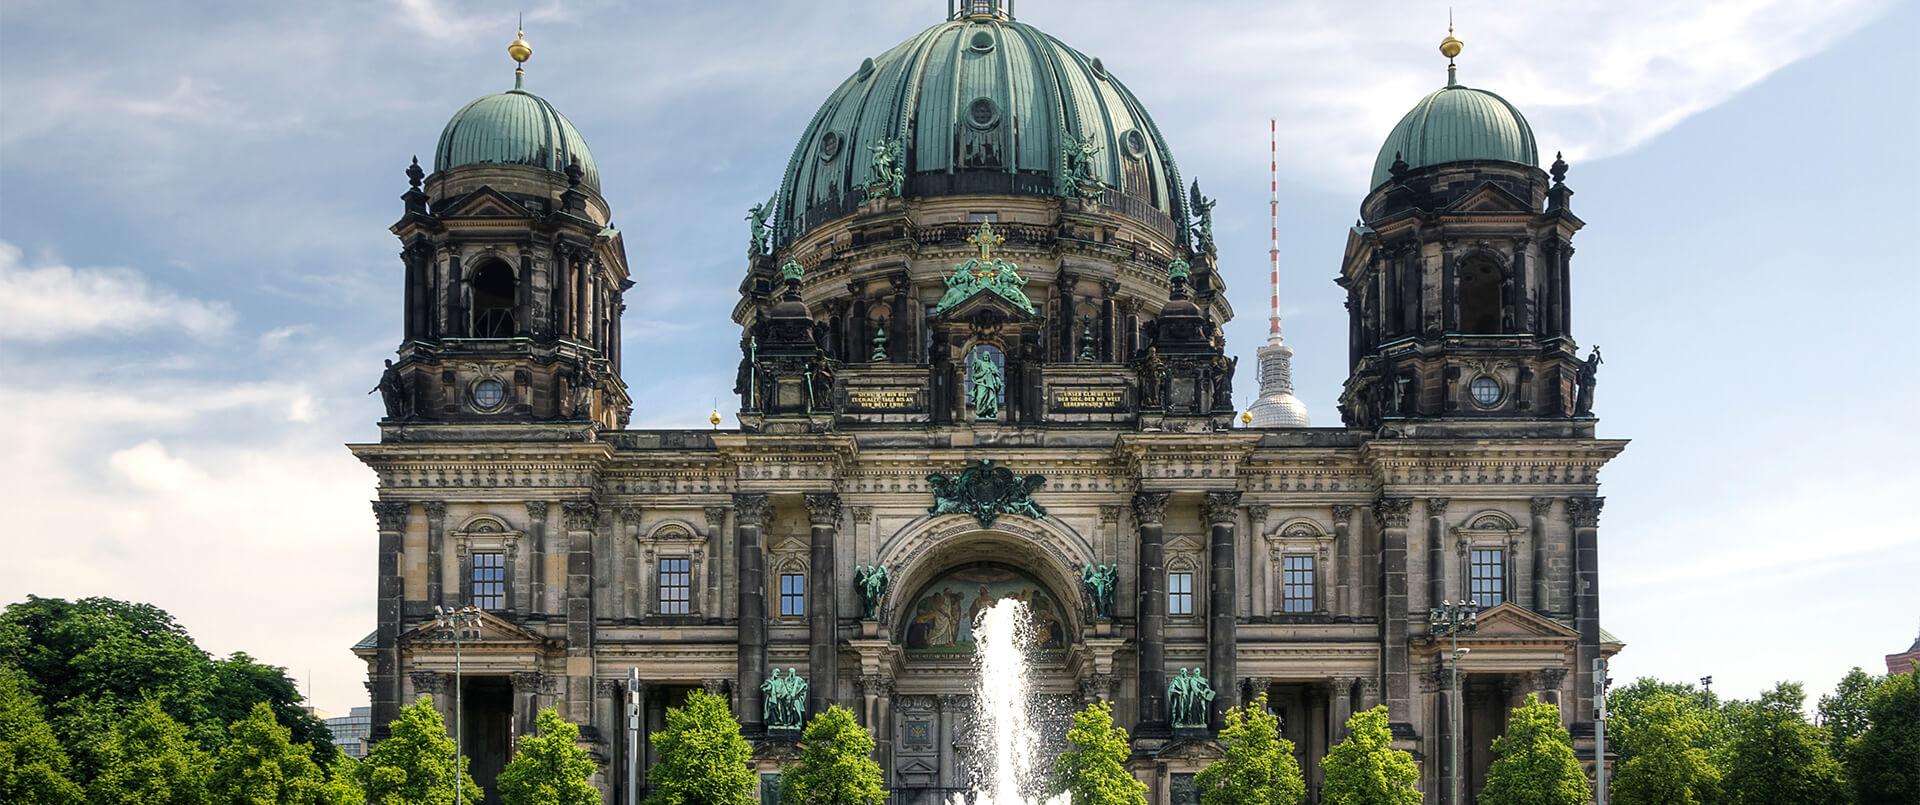 Opera and Ballet in Berlin